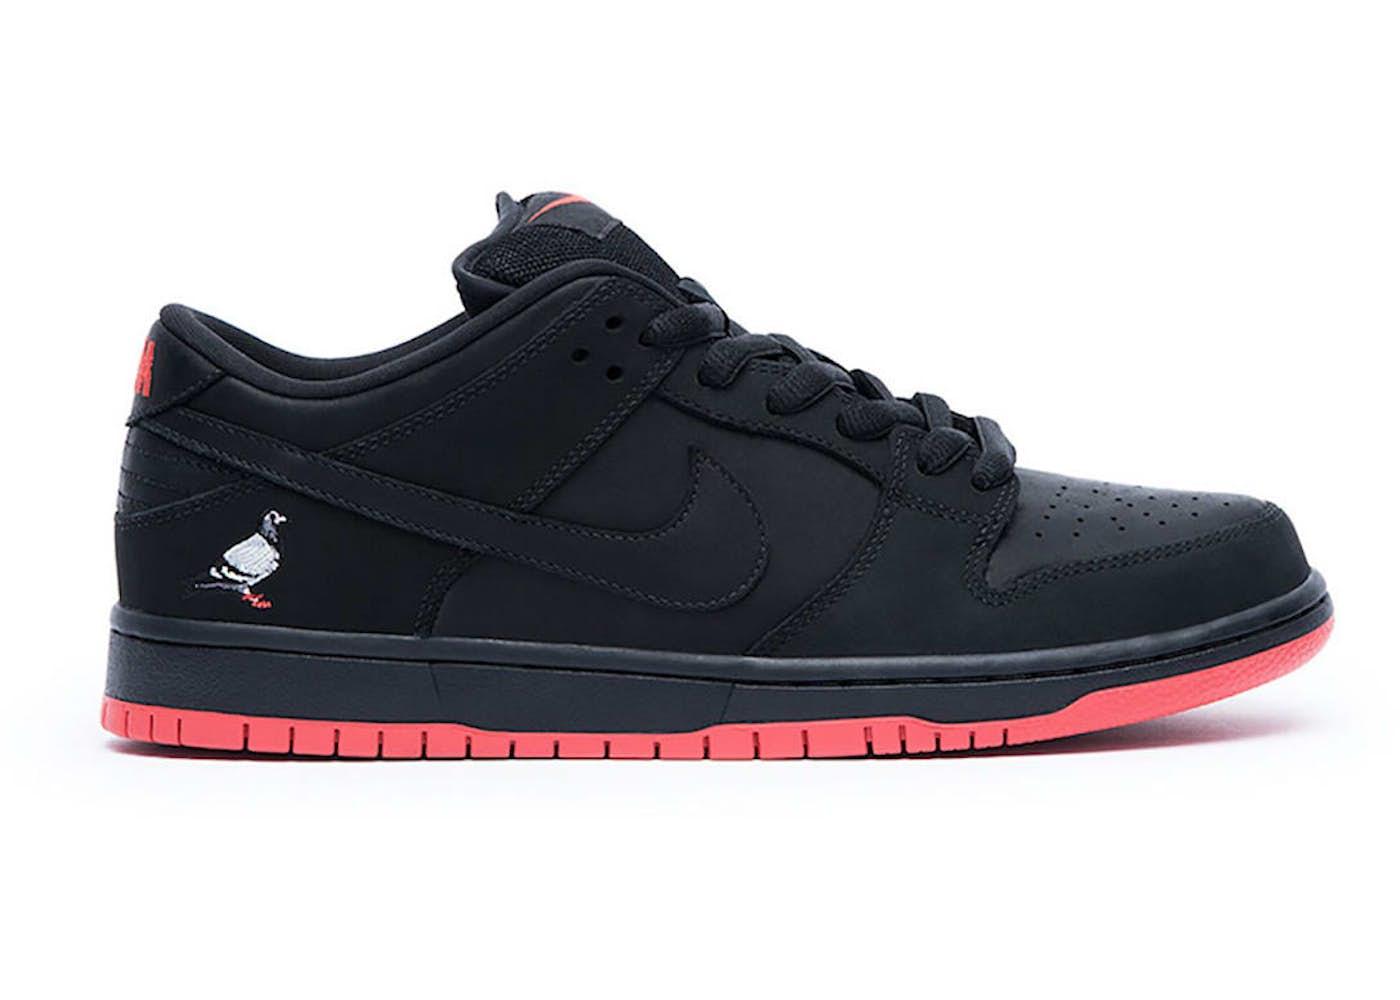 Nike Sb Dunk Low Black